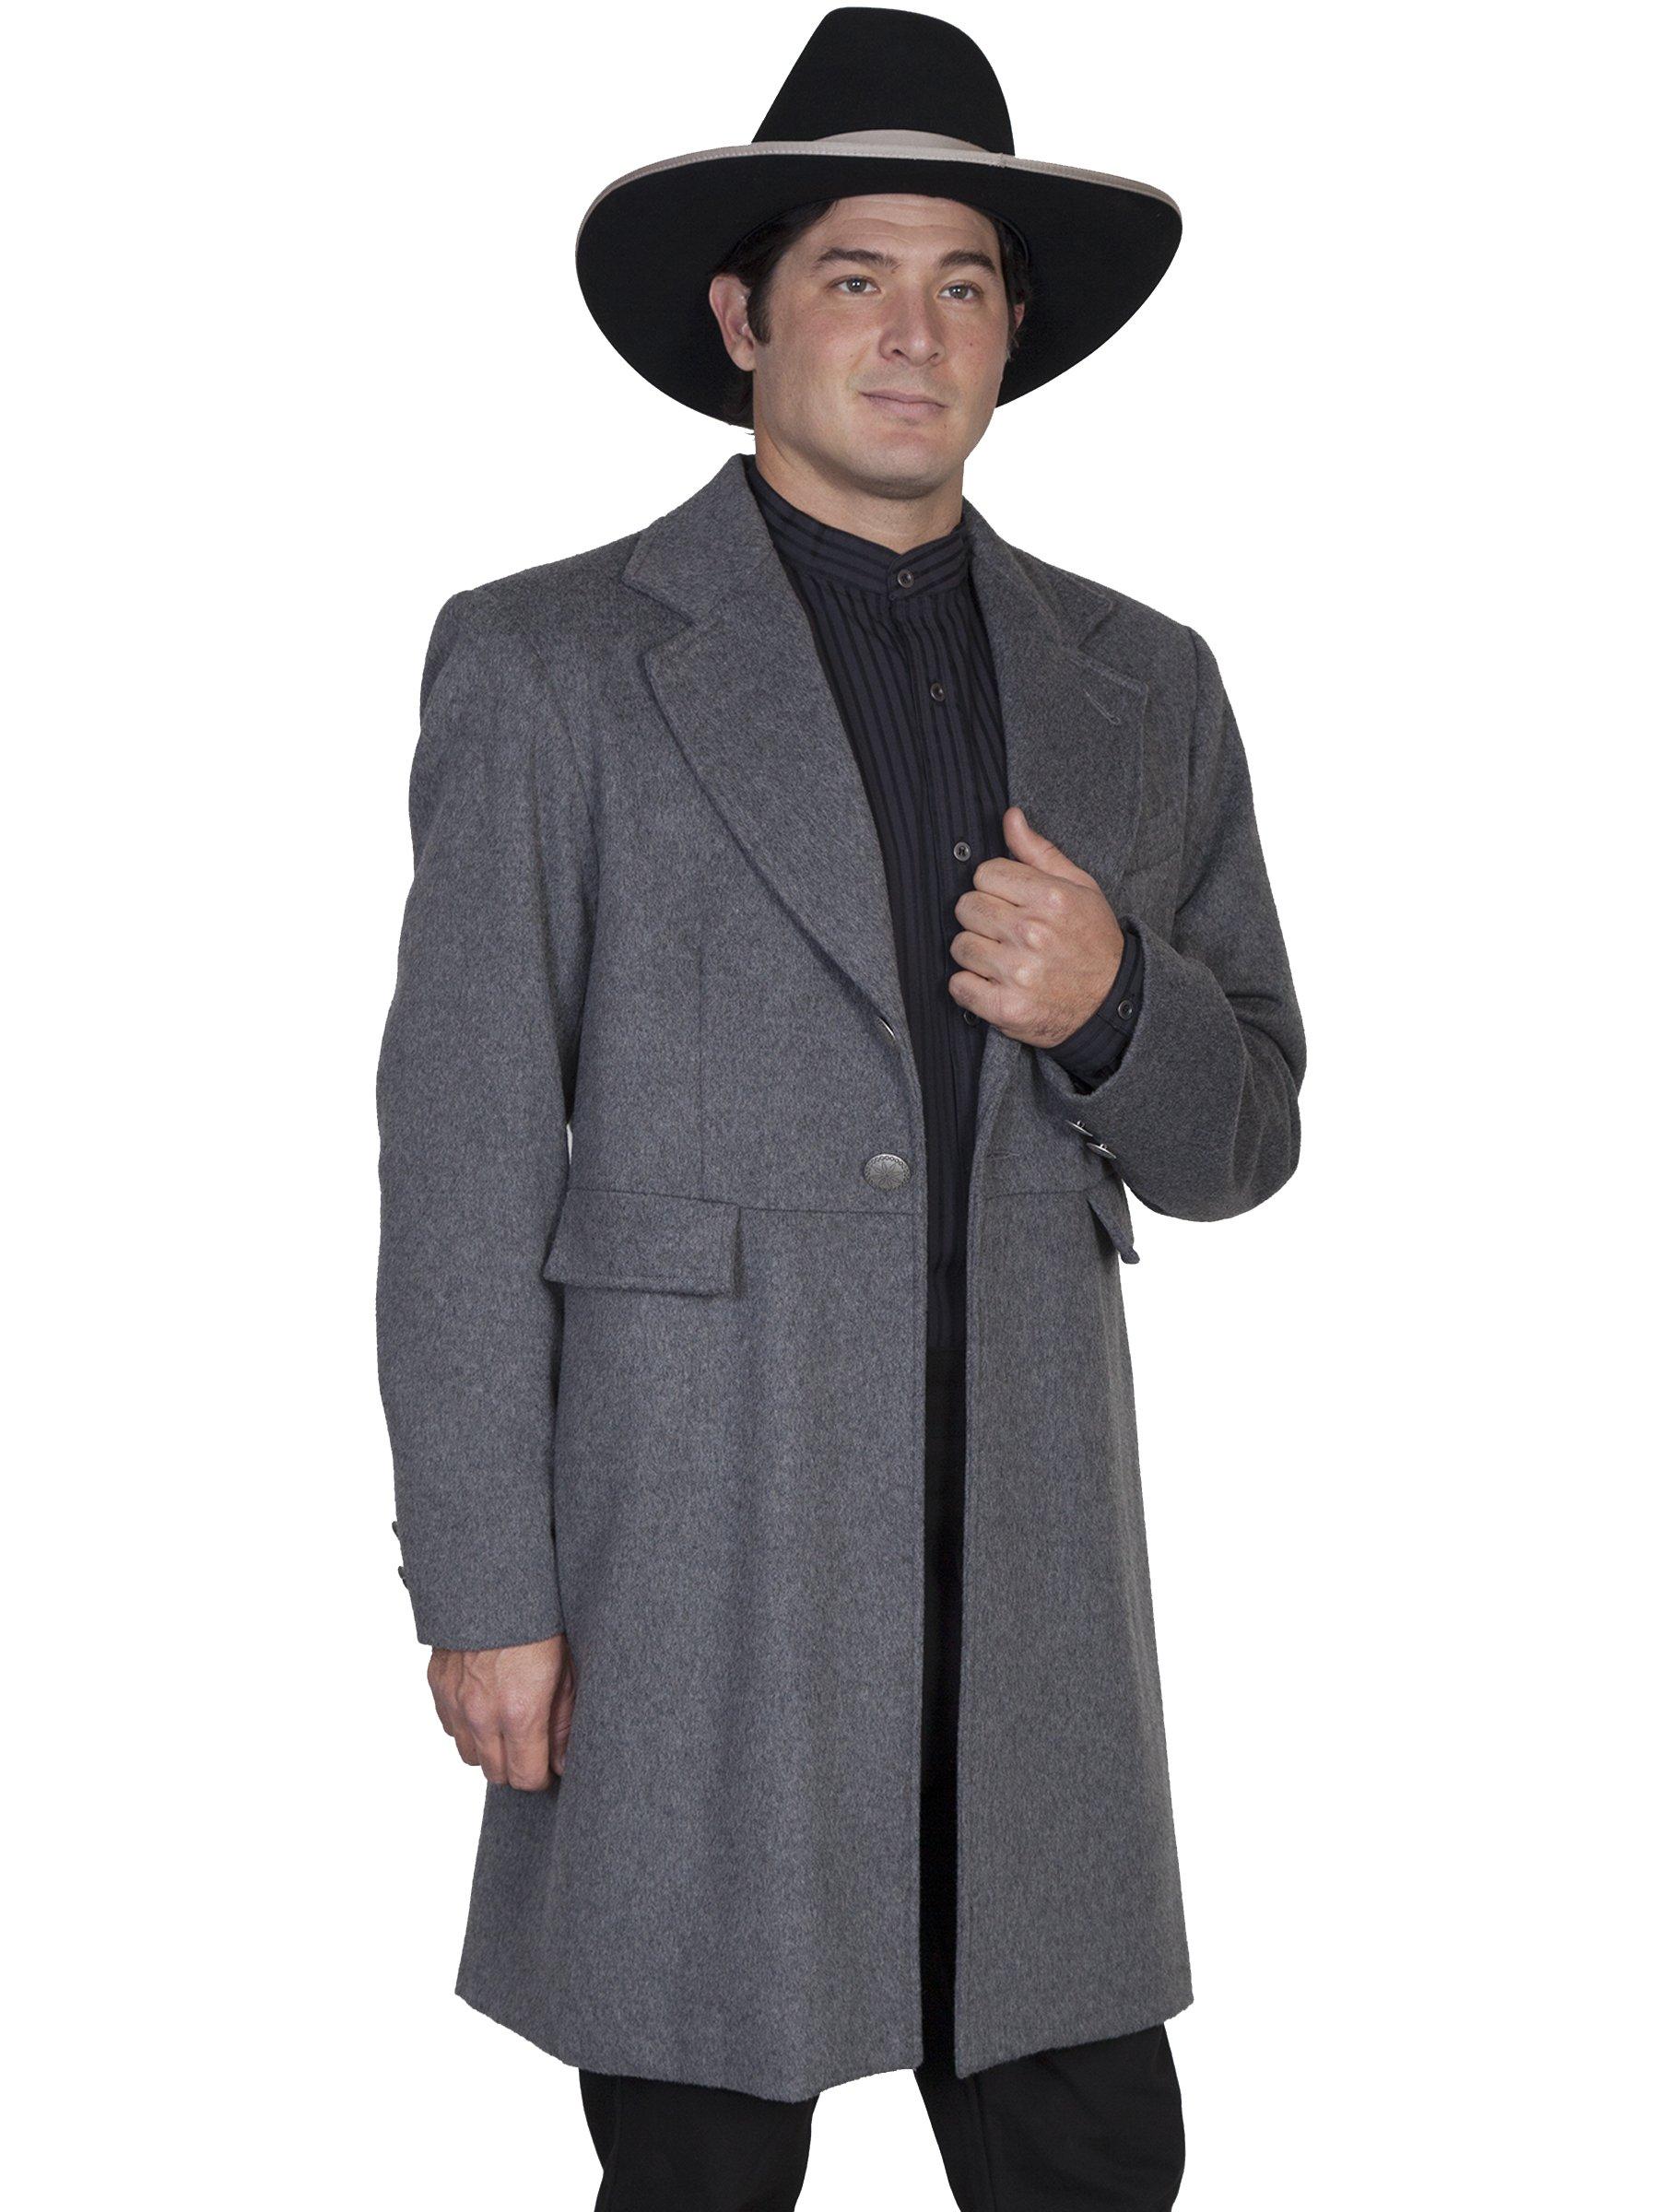 WahMaker by Scully Men's Old West Wool Blend Frock Coat Charcoal Grey 52